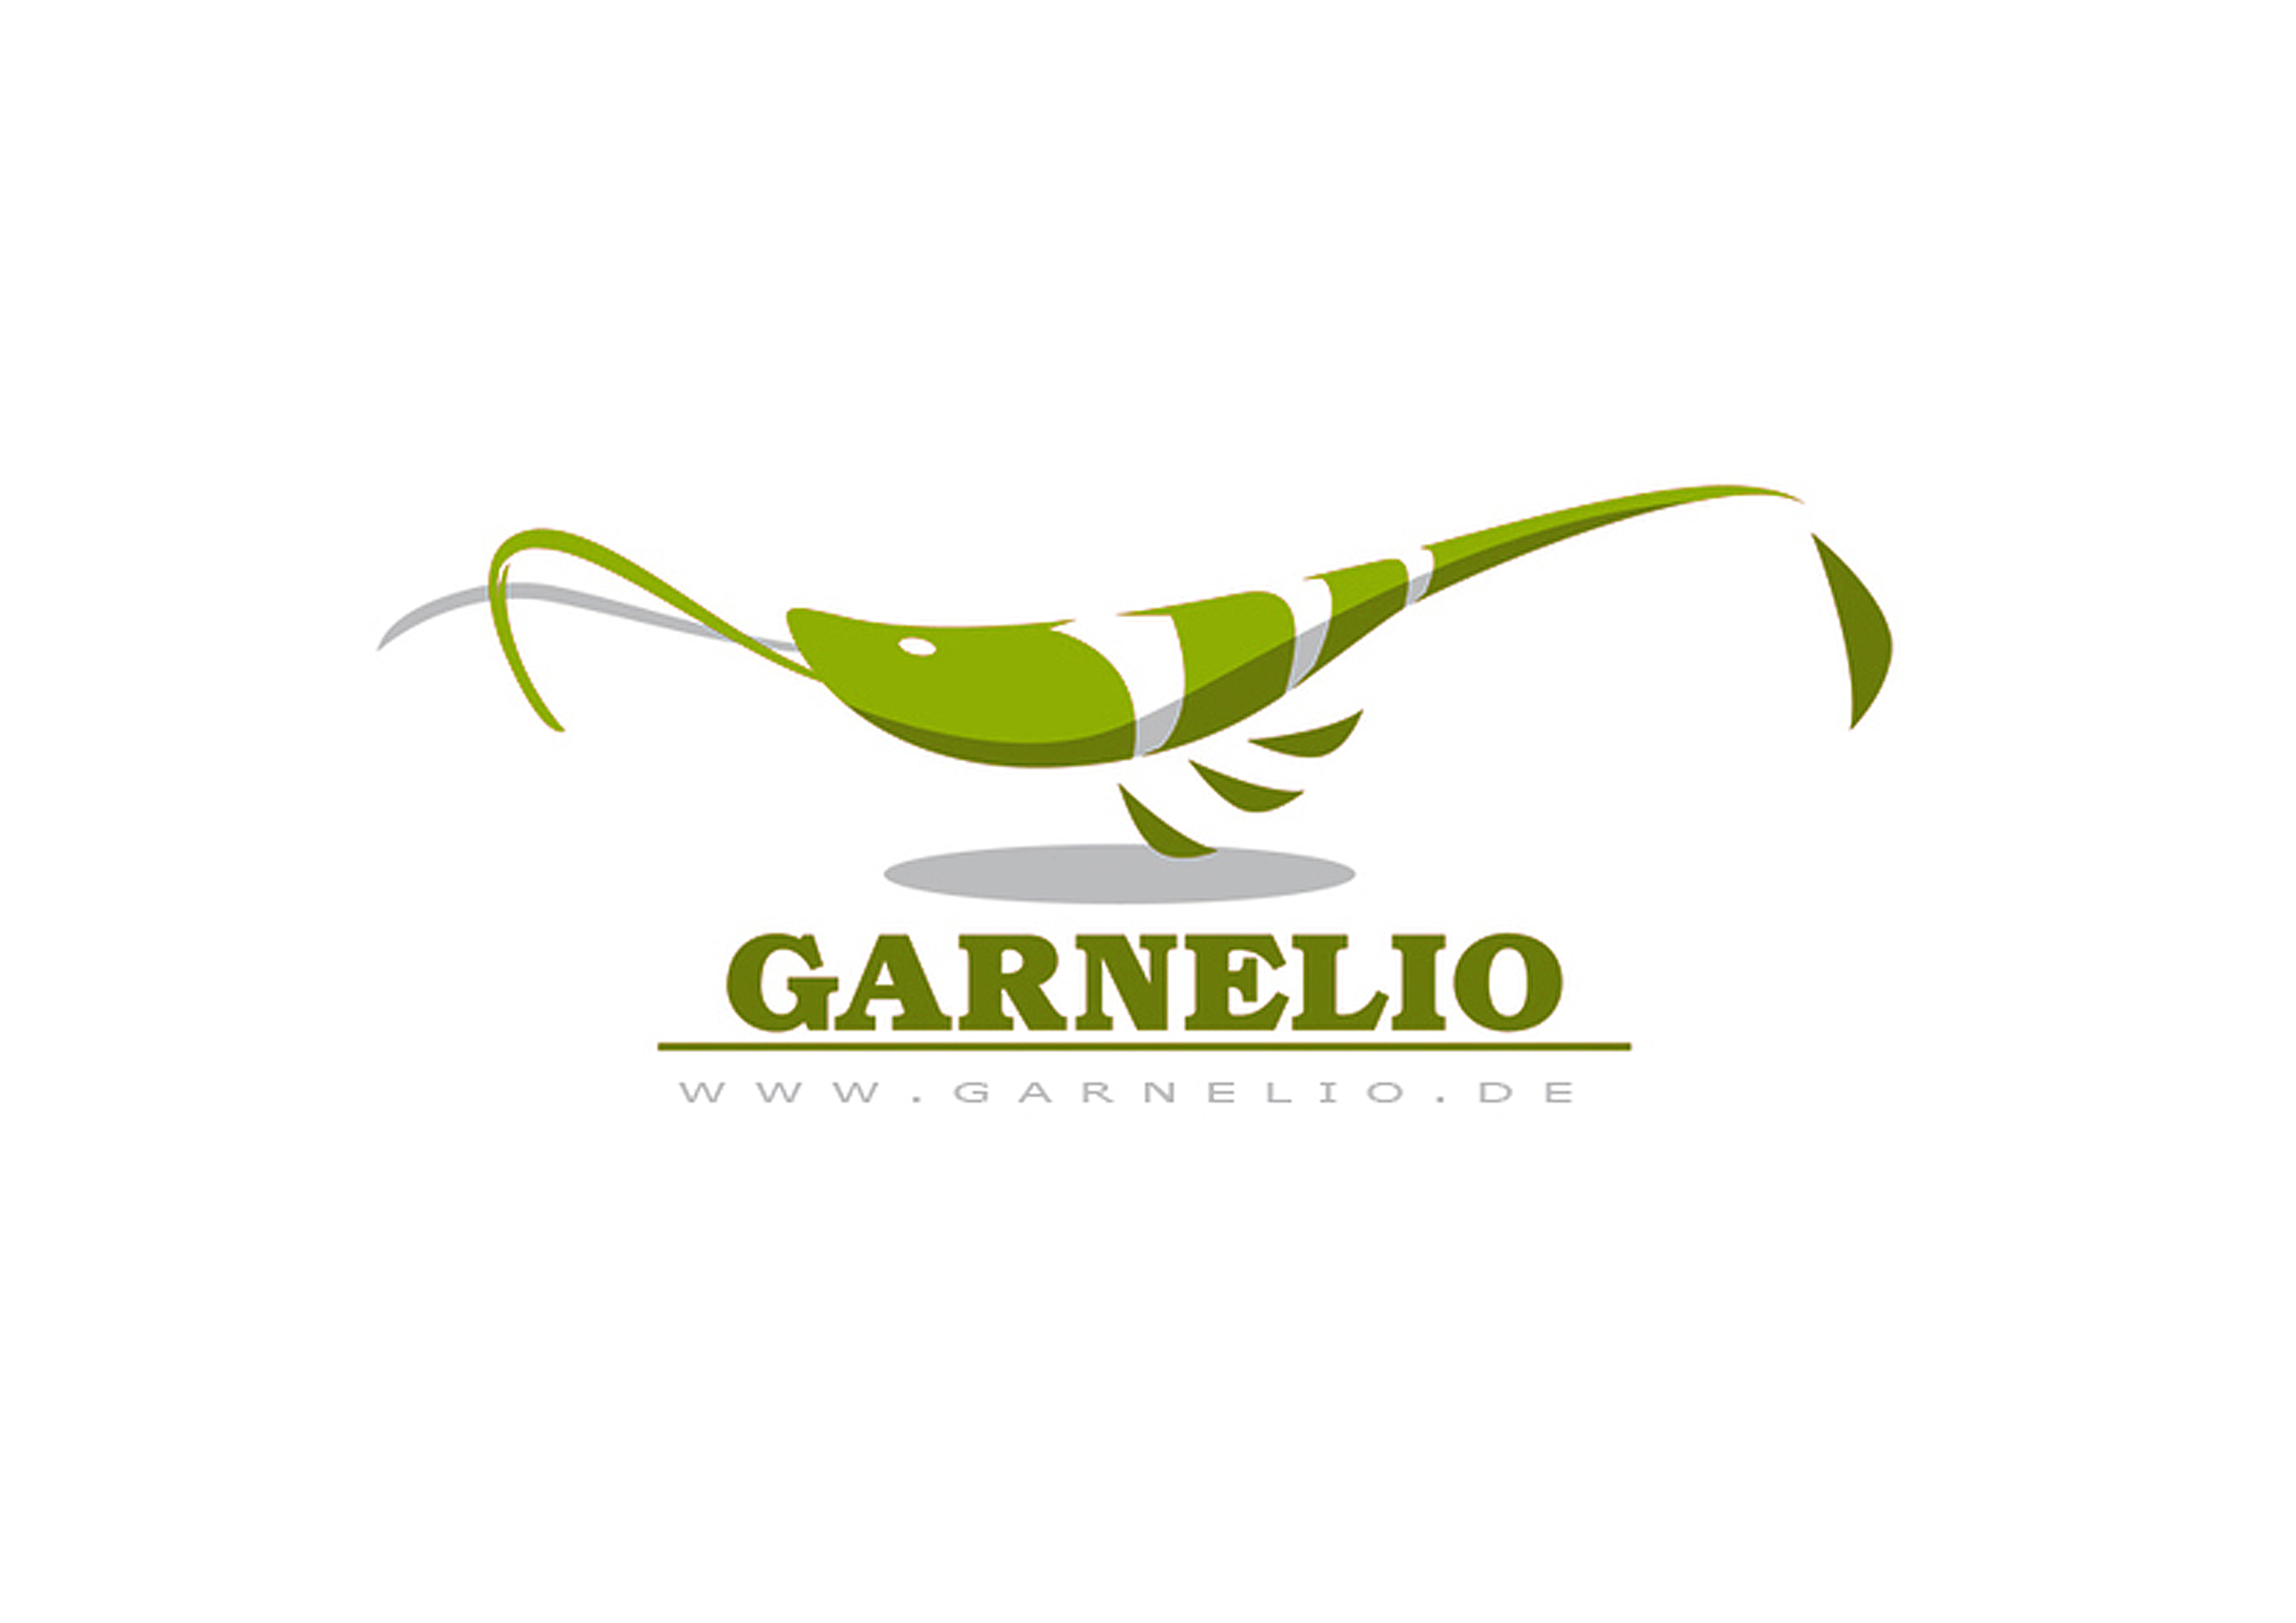 Garnelio